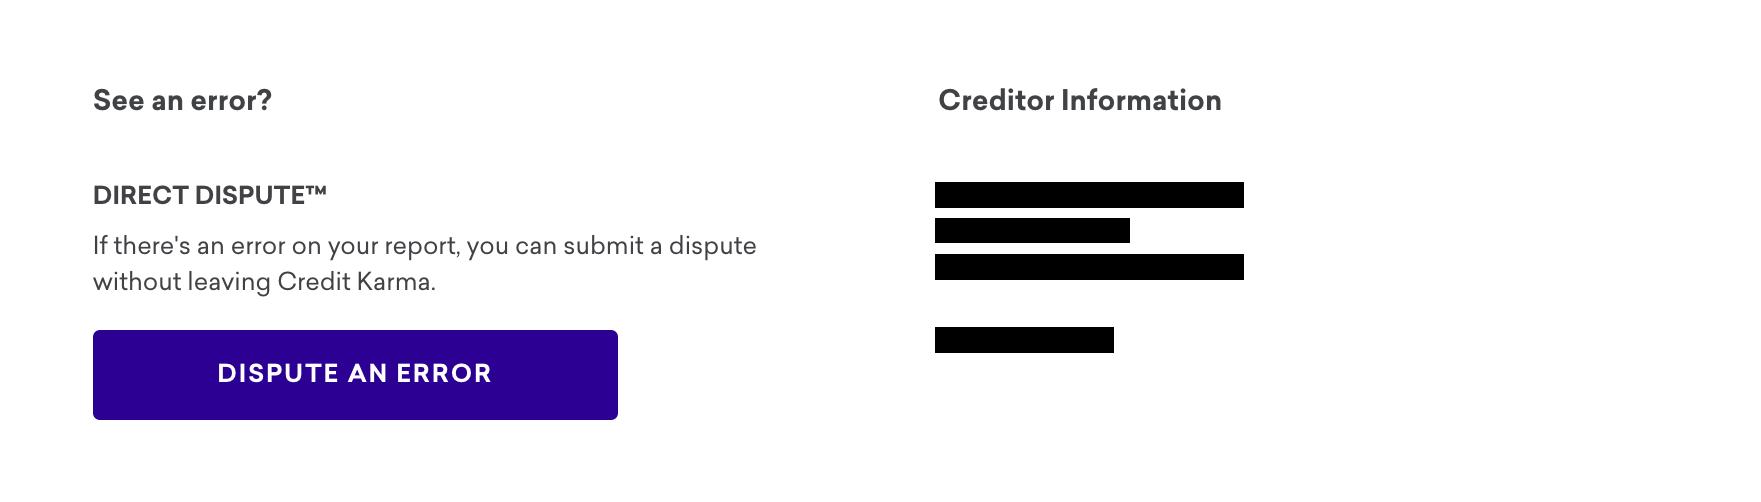 How to use Credit Karma Direct Dispute | Credit Karma